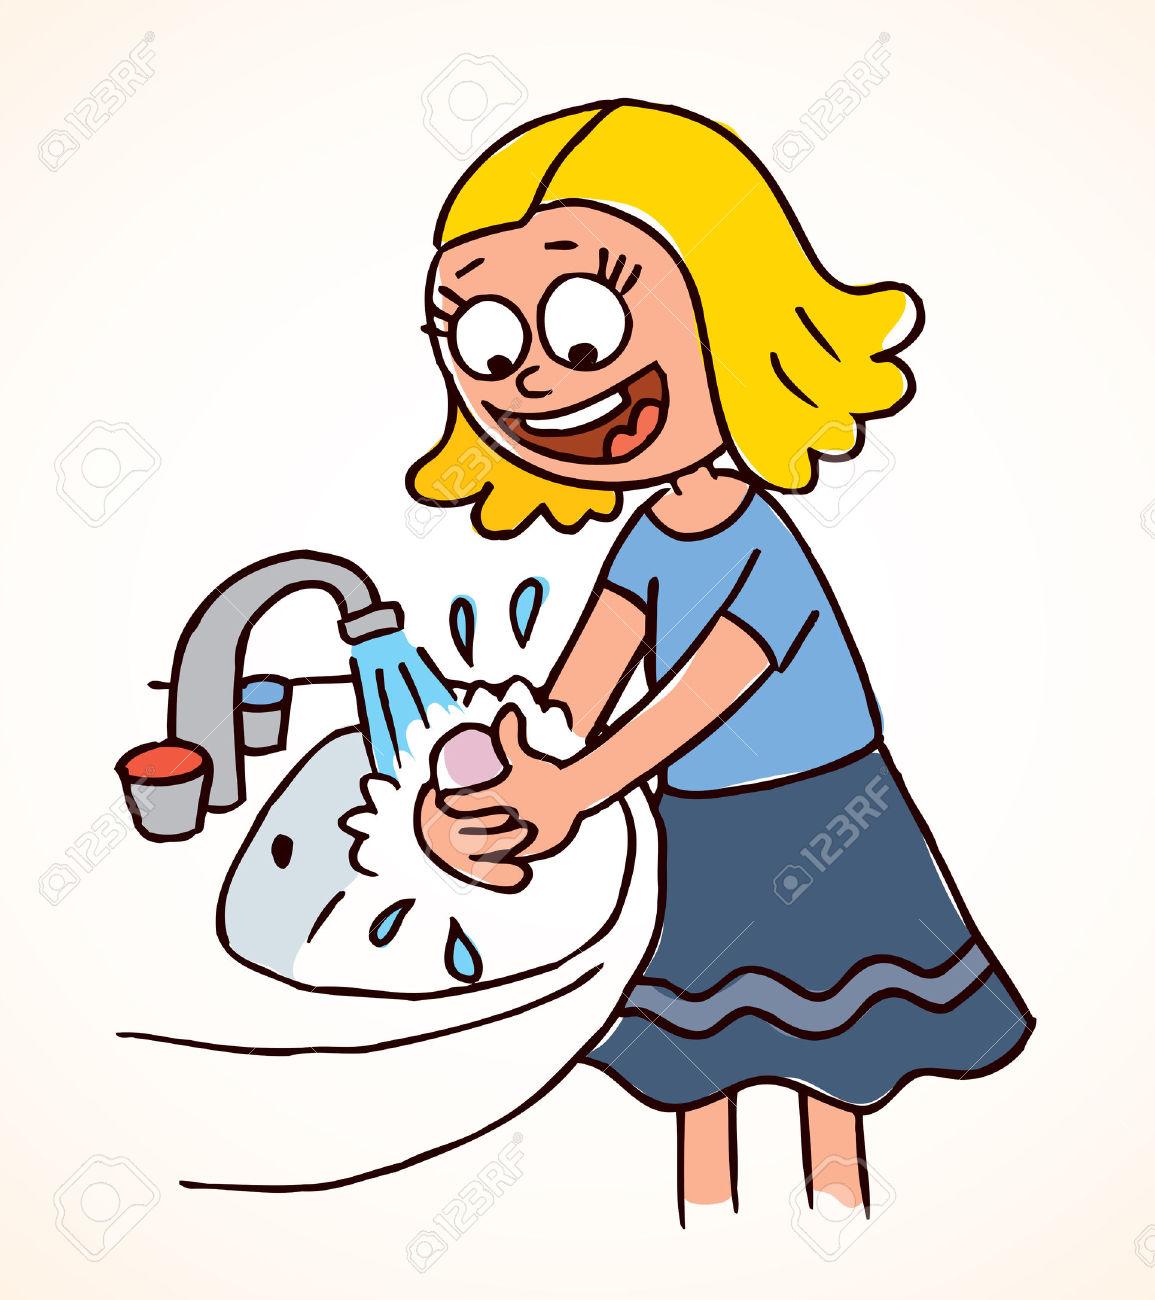 Wash Hands Clipart.